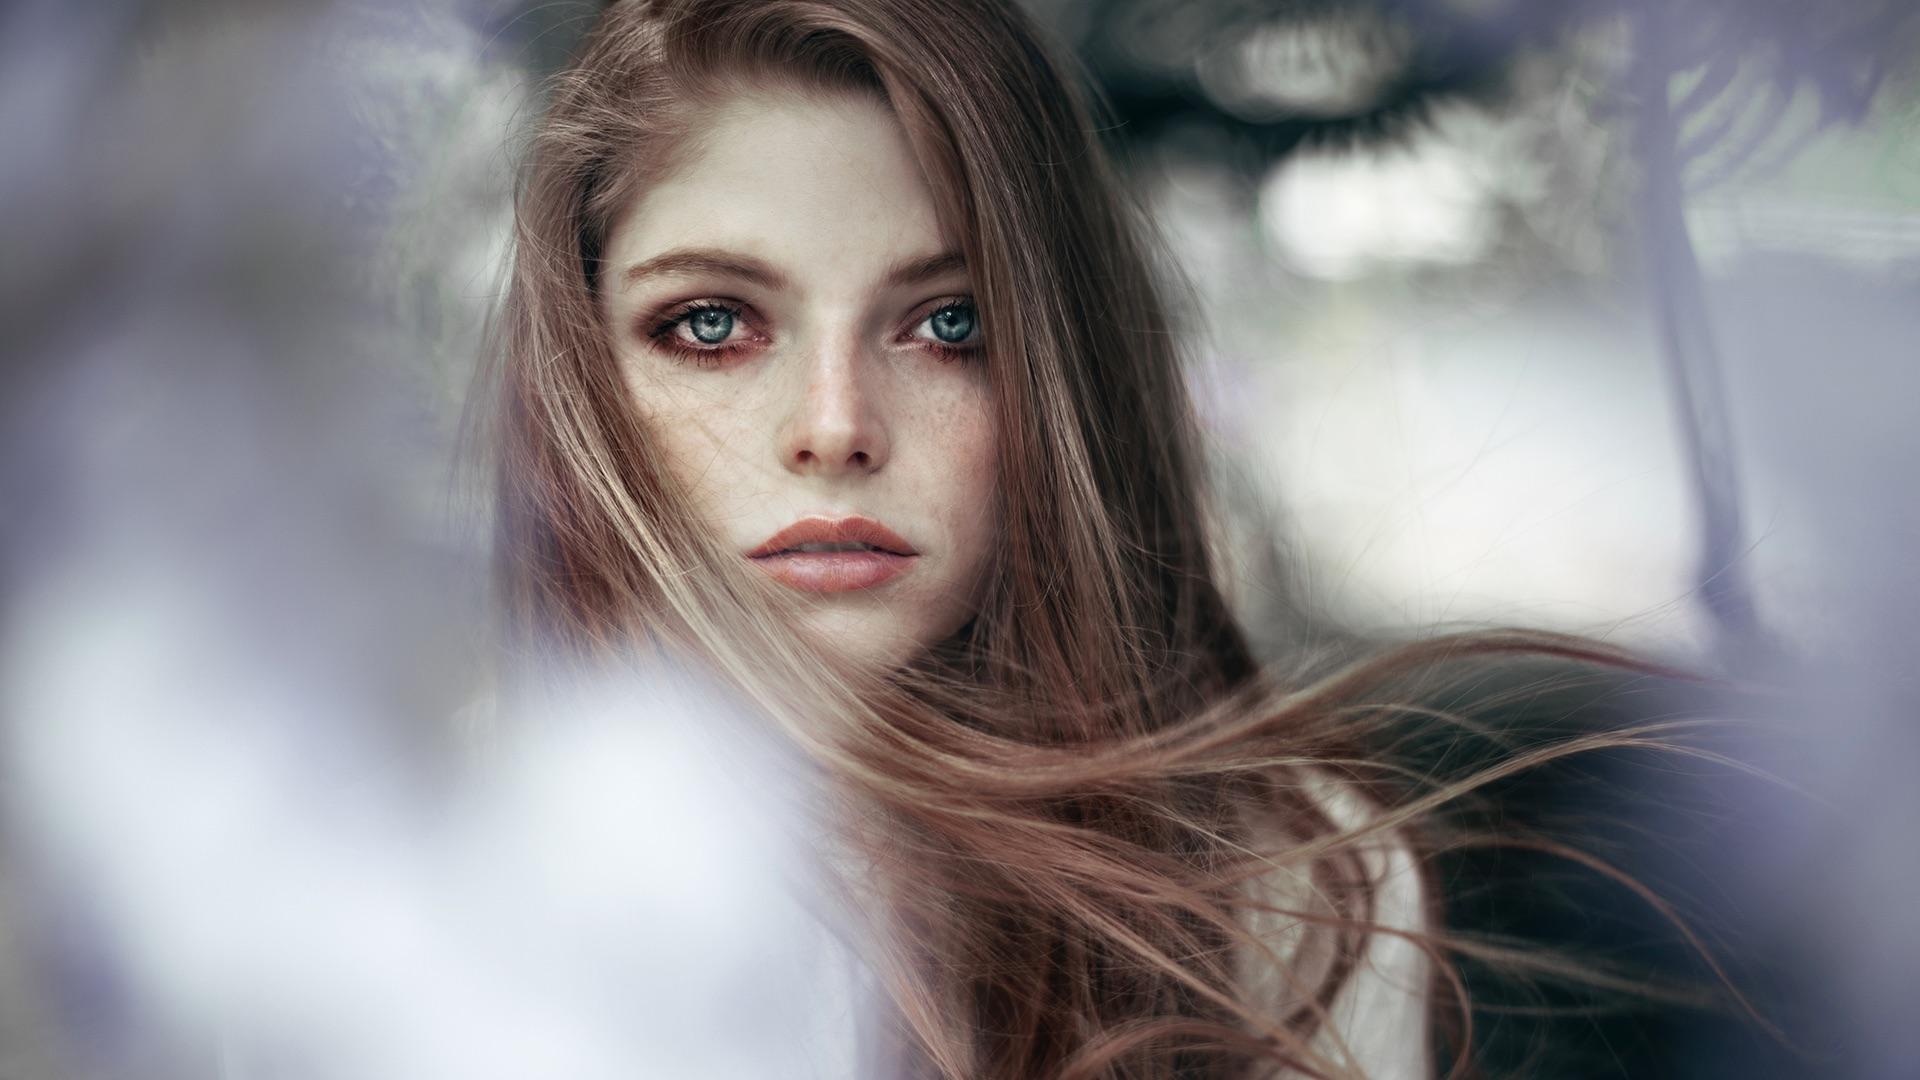 40+ Beautiful Bokeh Images That Capture Your Imagination